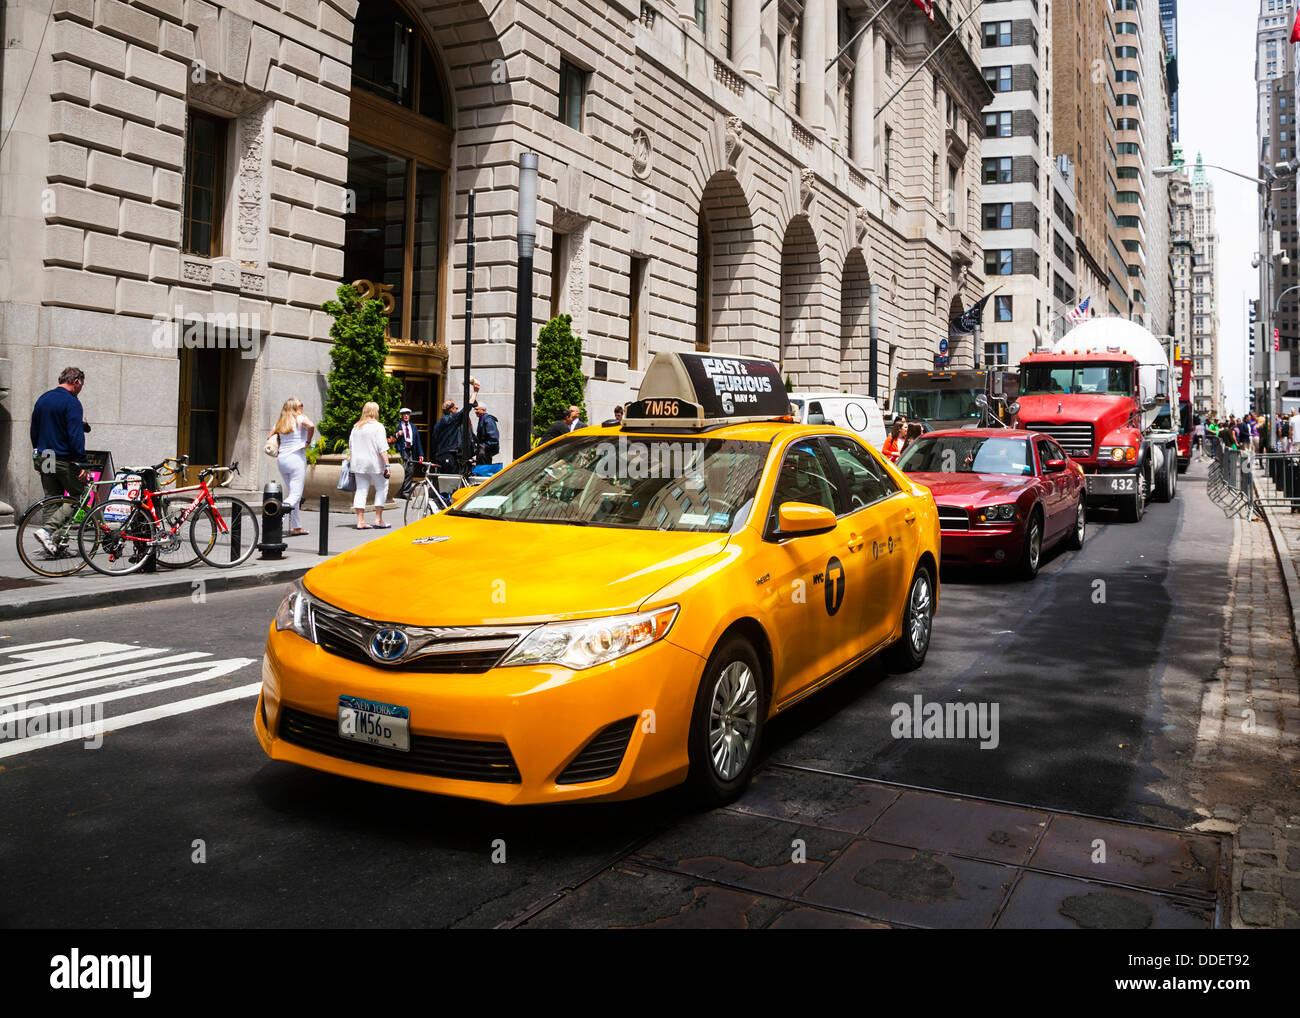 New York Yellow taxi cab, Manhattan, New York City, USA. Stock Photo